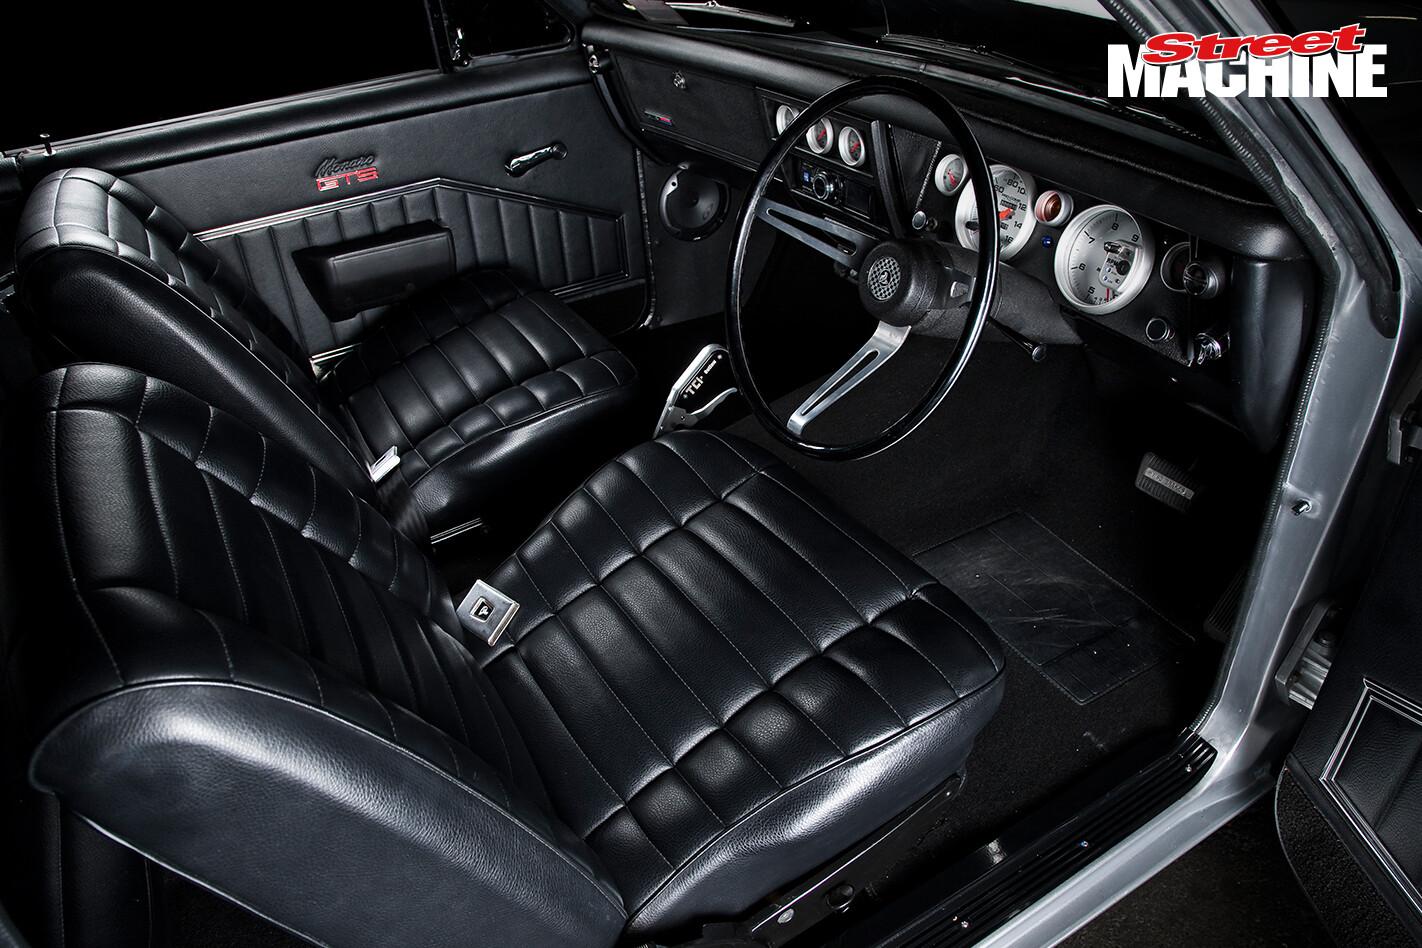 Holden HG Monaro GTS 355 V8 Interior 5